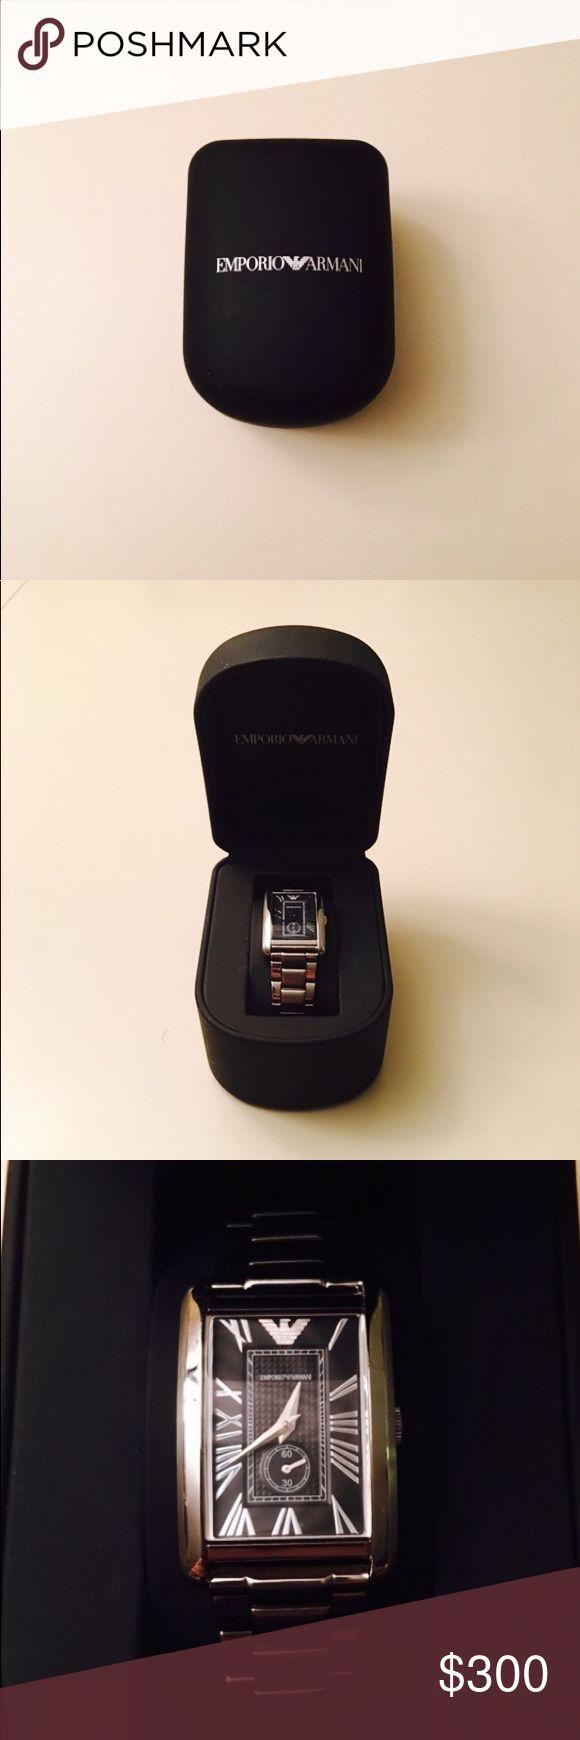 🎉SALE🎉Emporio Armani Watch Emporio Armani men's silver and black watch. Brand new in box. In perfect condition, just needs a new battery! Emporio Armani Accessories Watches